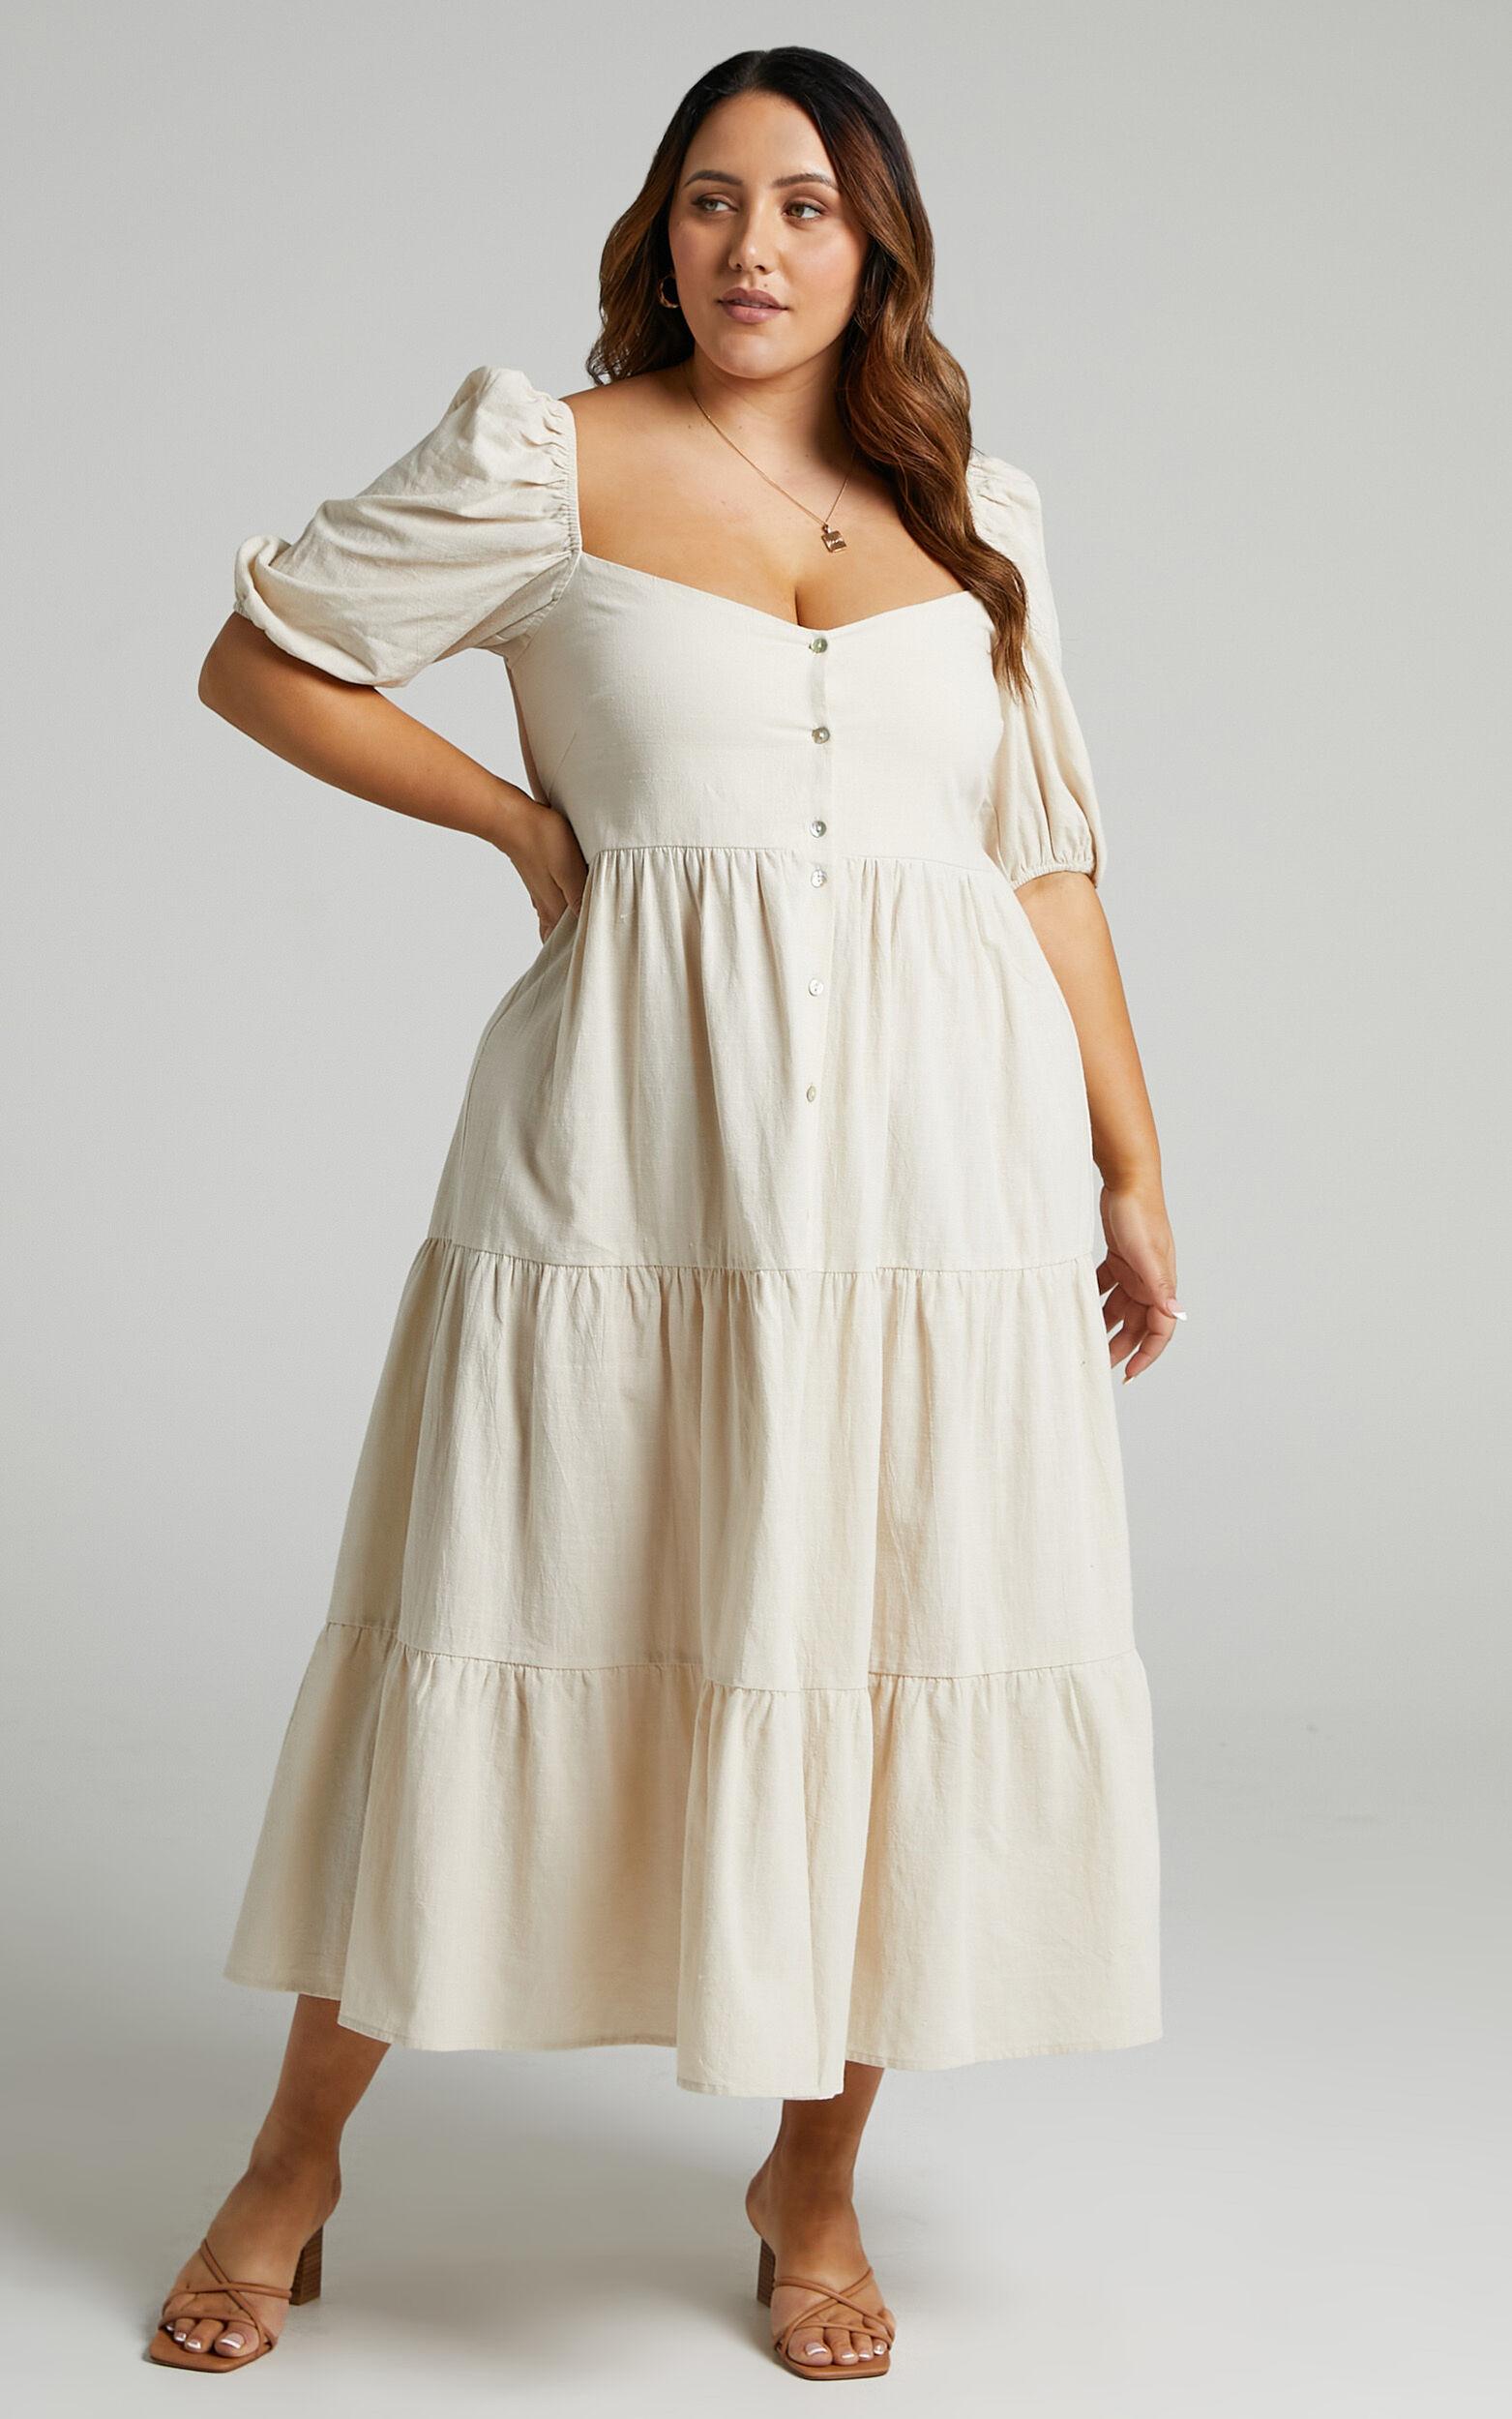 Palmer Dress in Cream - 06, CRE4, super-hi-res image number null